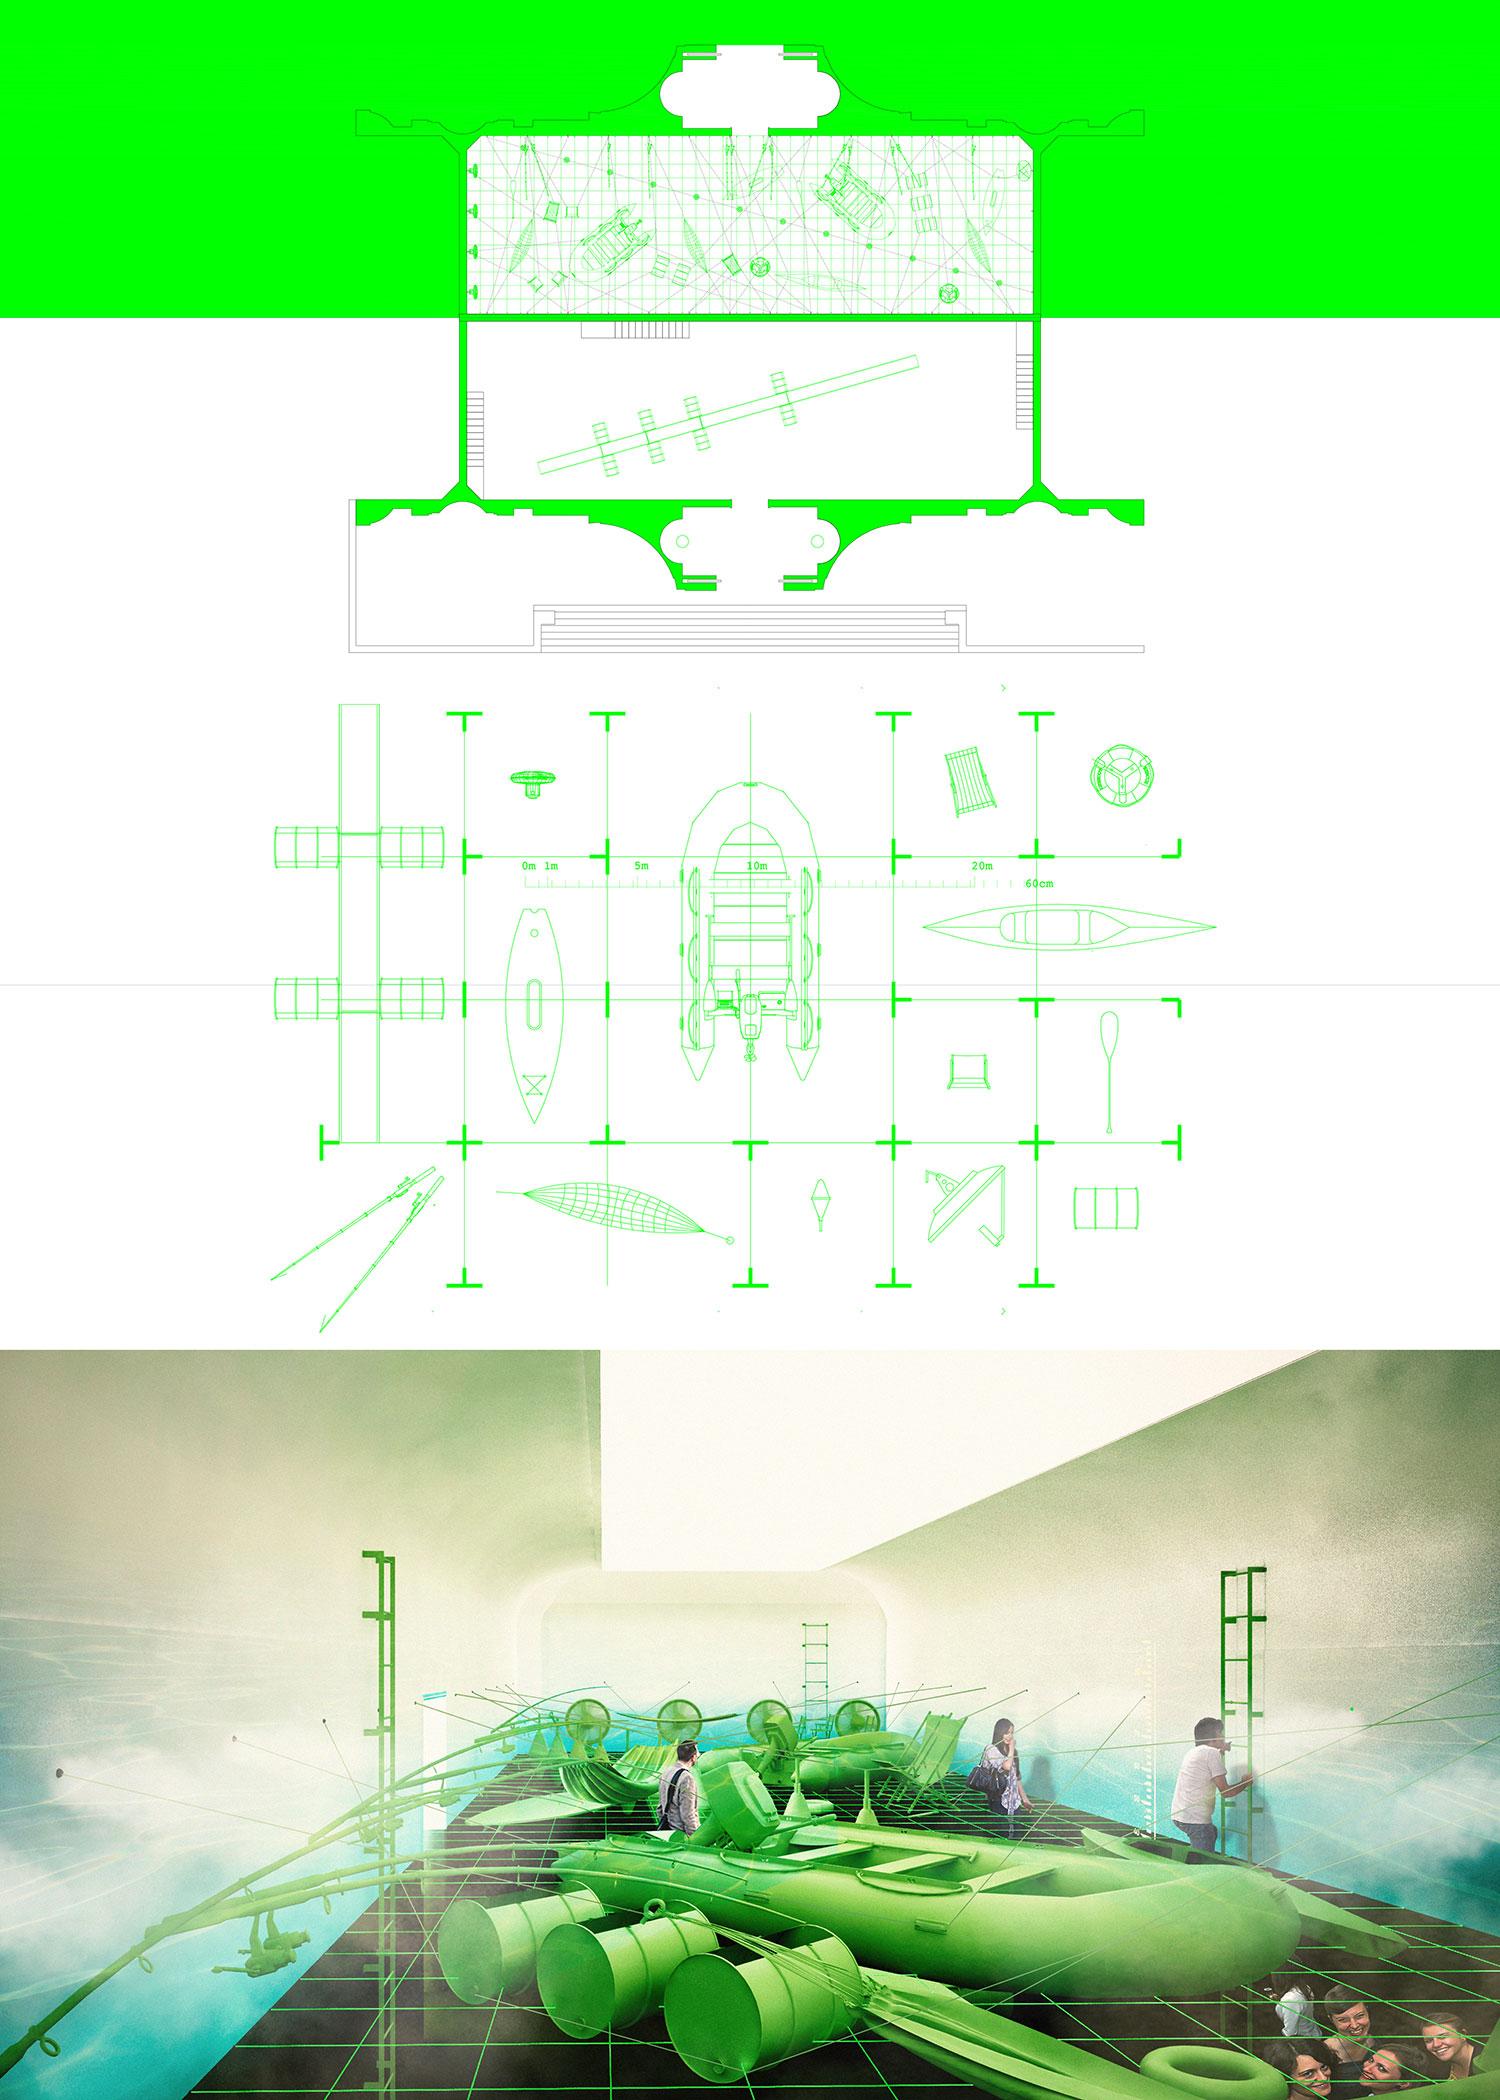 La-Biennale-di-Venezia-2018_Off-Grid-Plakat-2